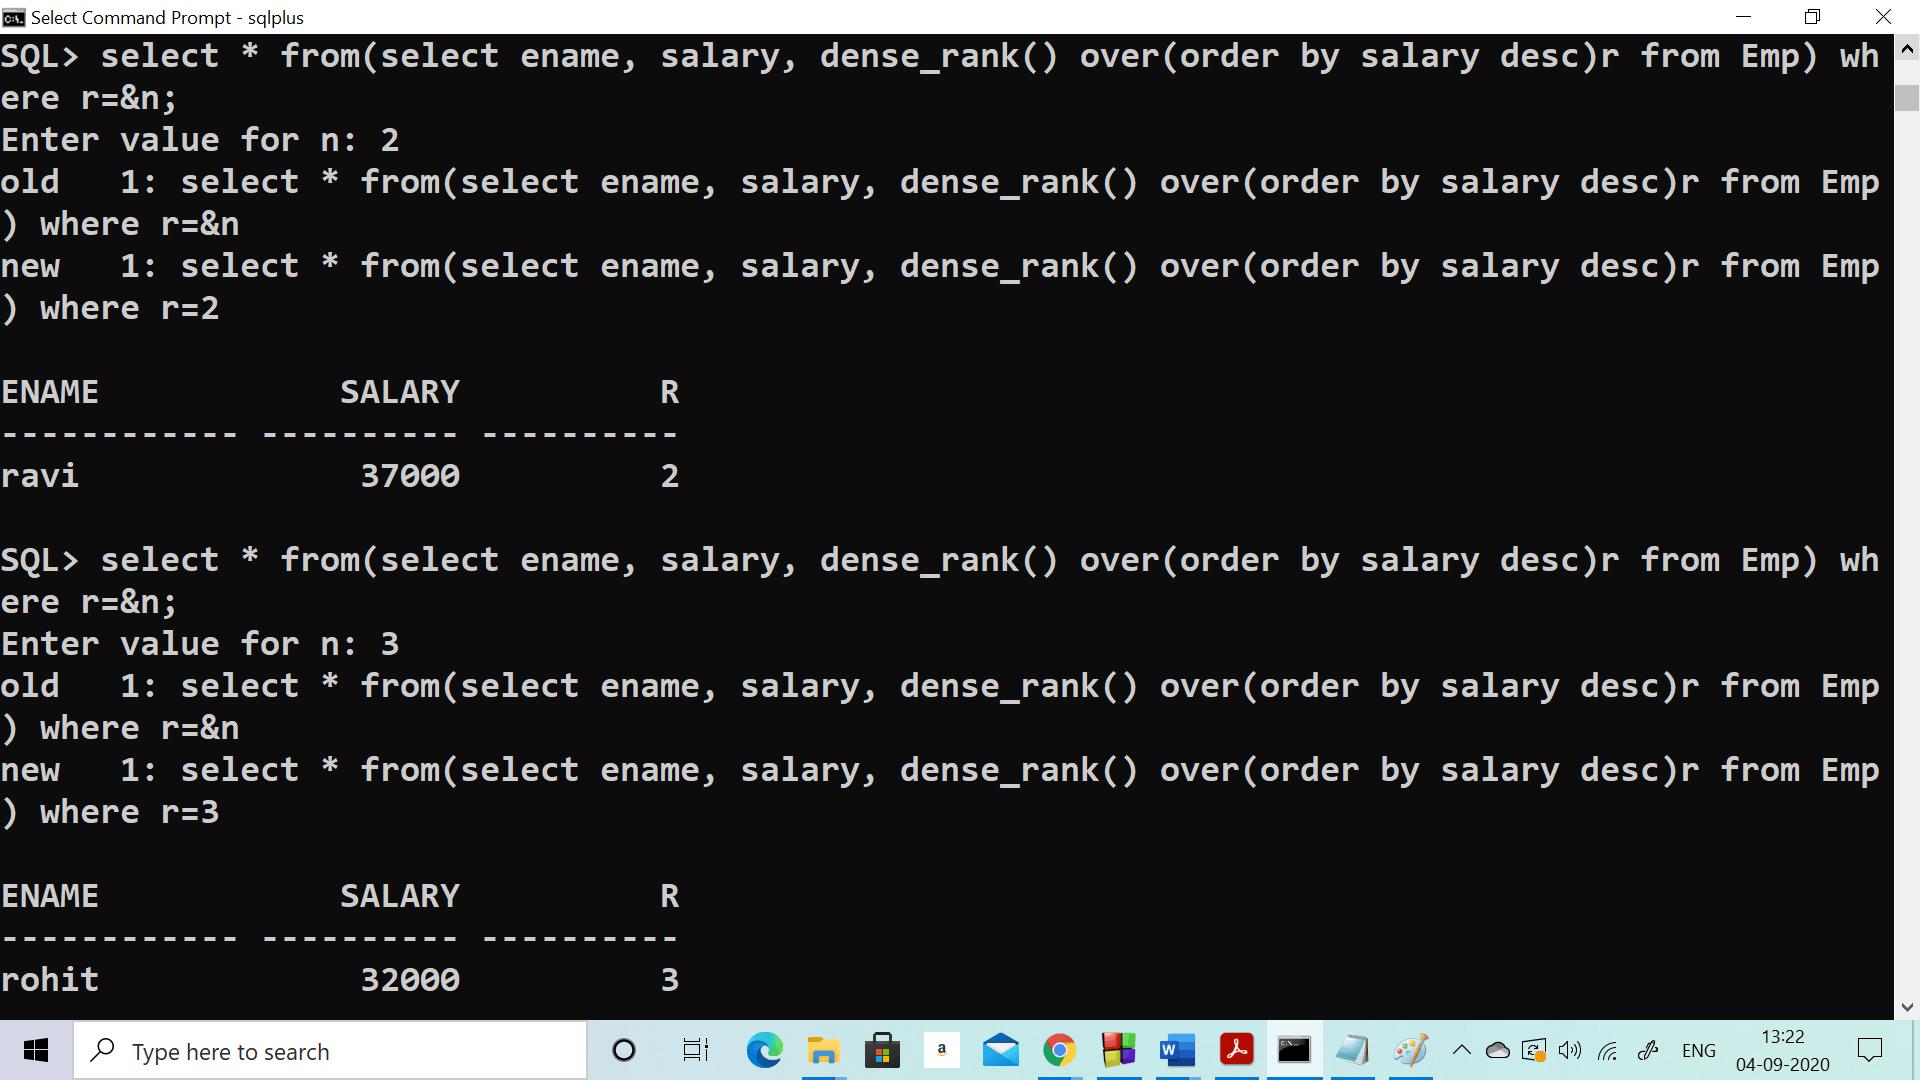 Nth Highest salary